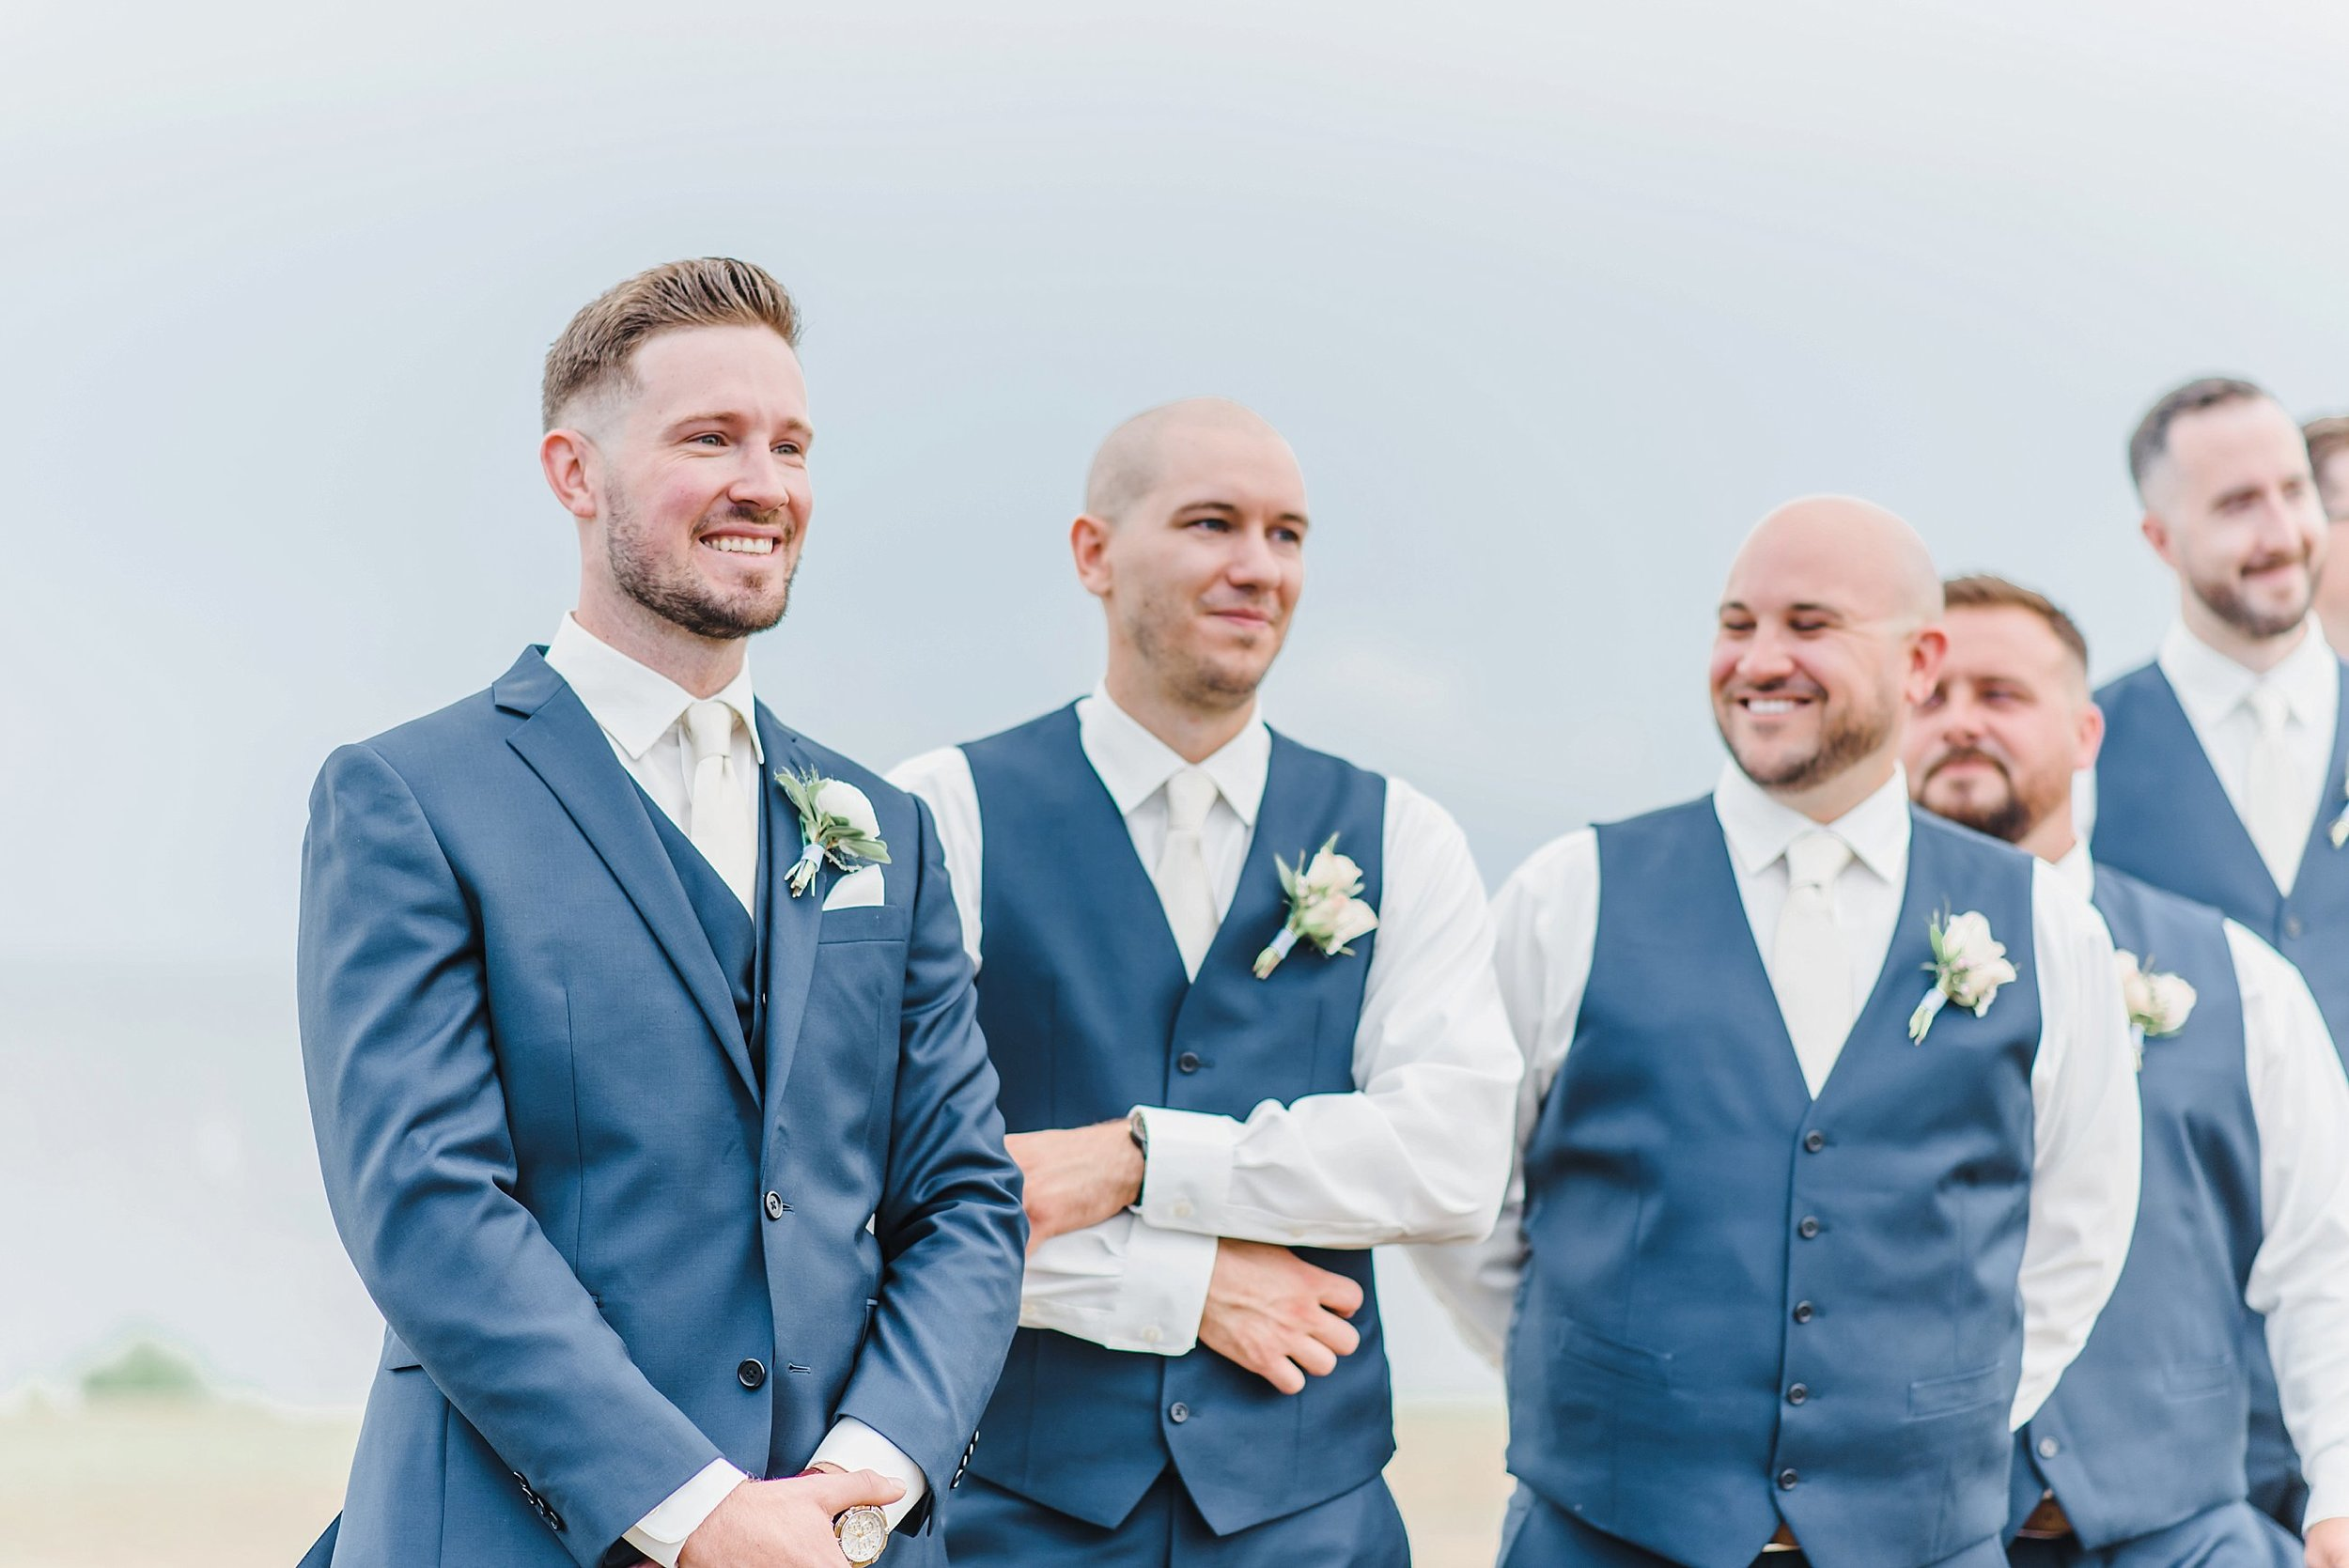 light airy indie fine art ottawa wedding photographer | Ali and Batoul Photography_0180.jpg